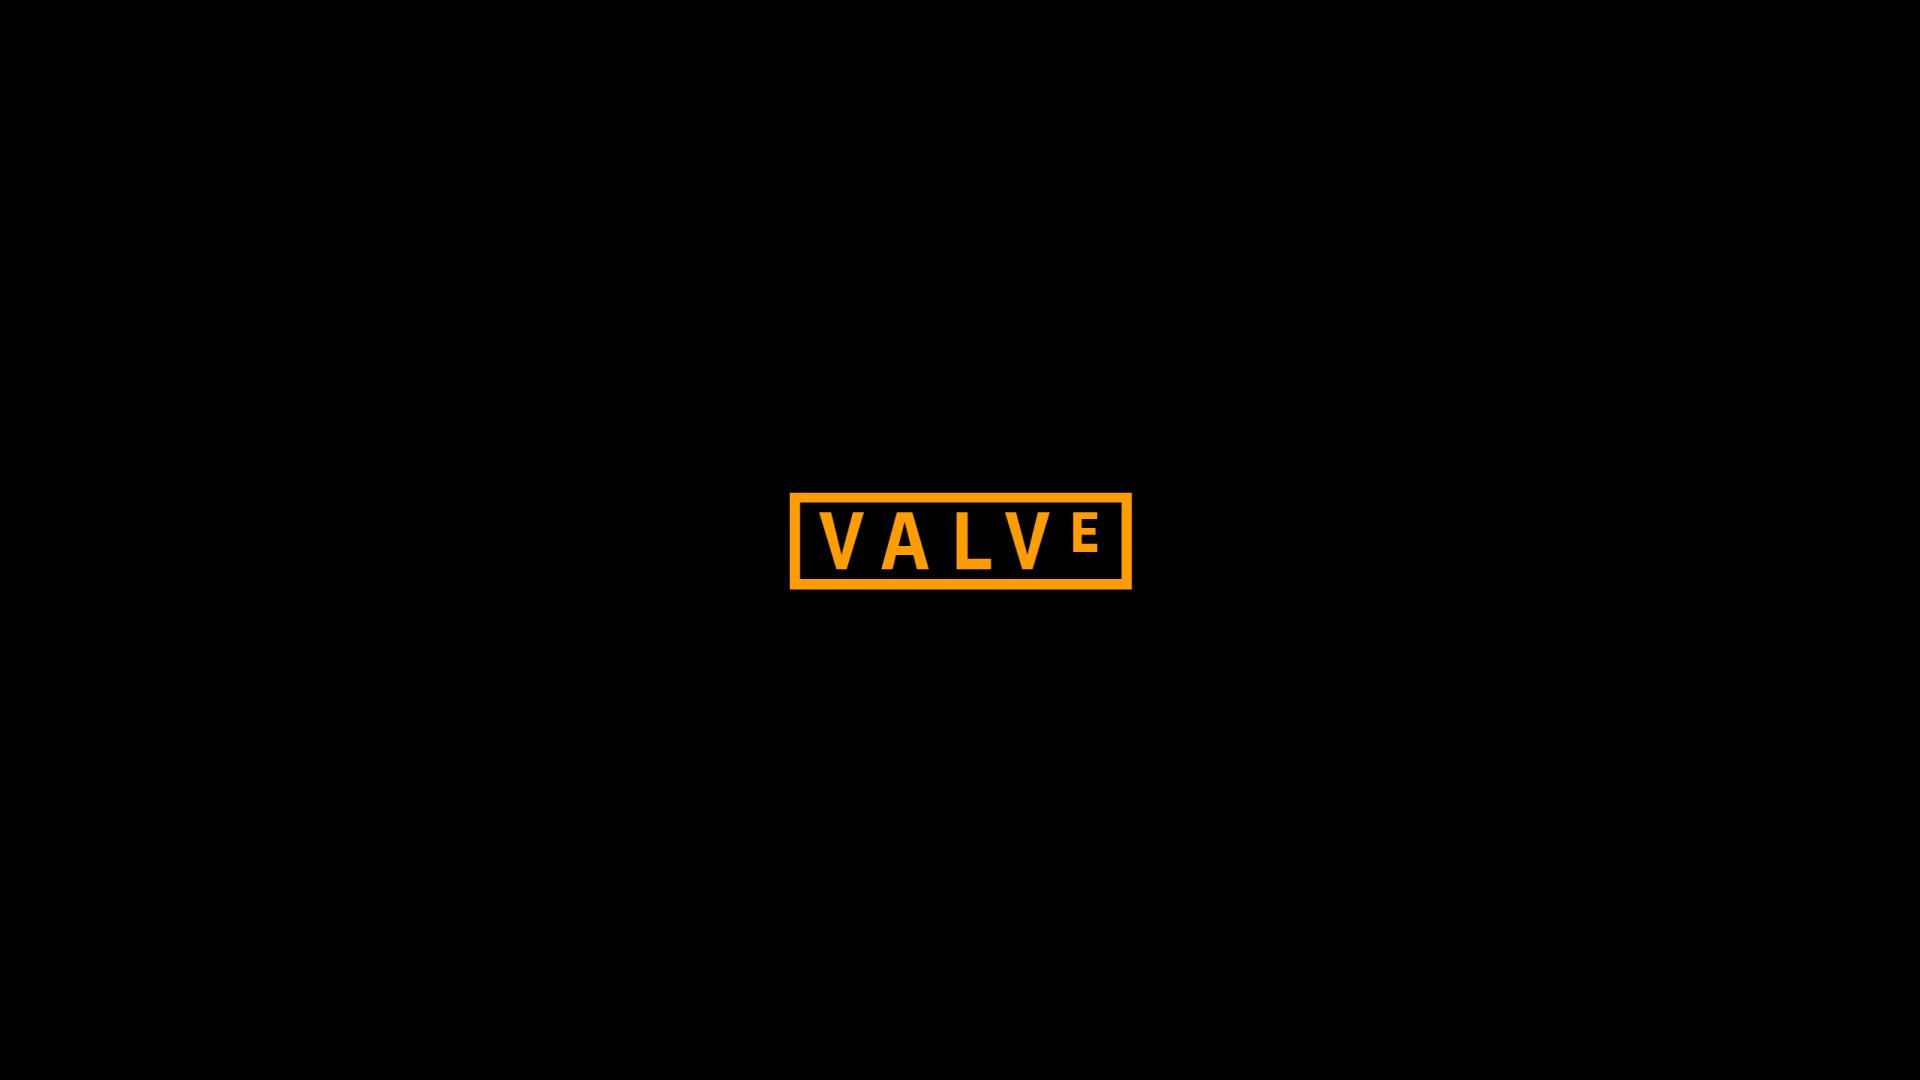 ws_Valve_Logo_1920x1080